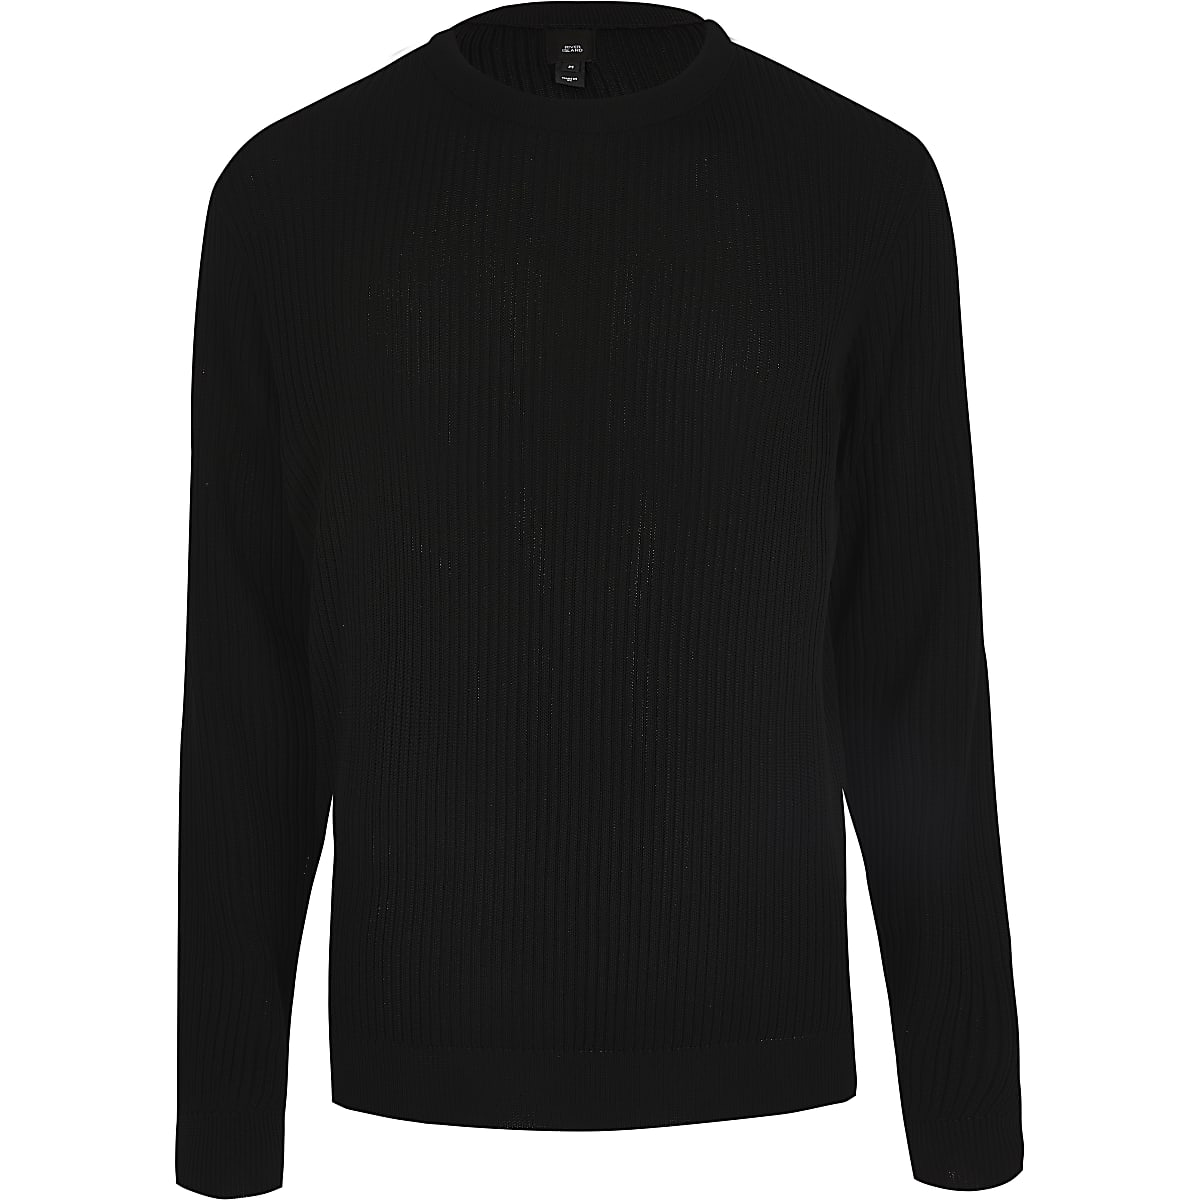 Black rib knitted slim fit sweater